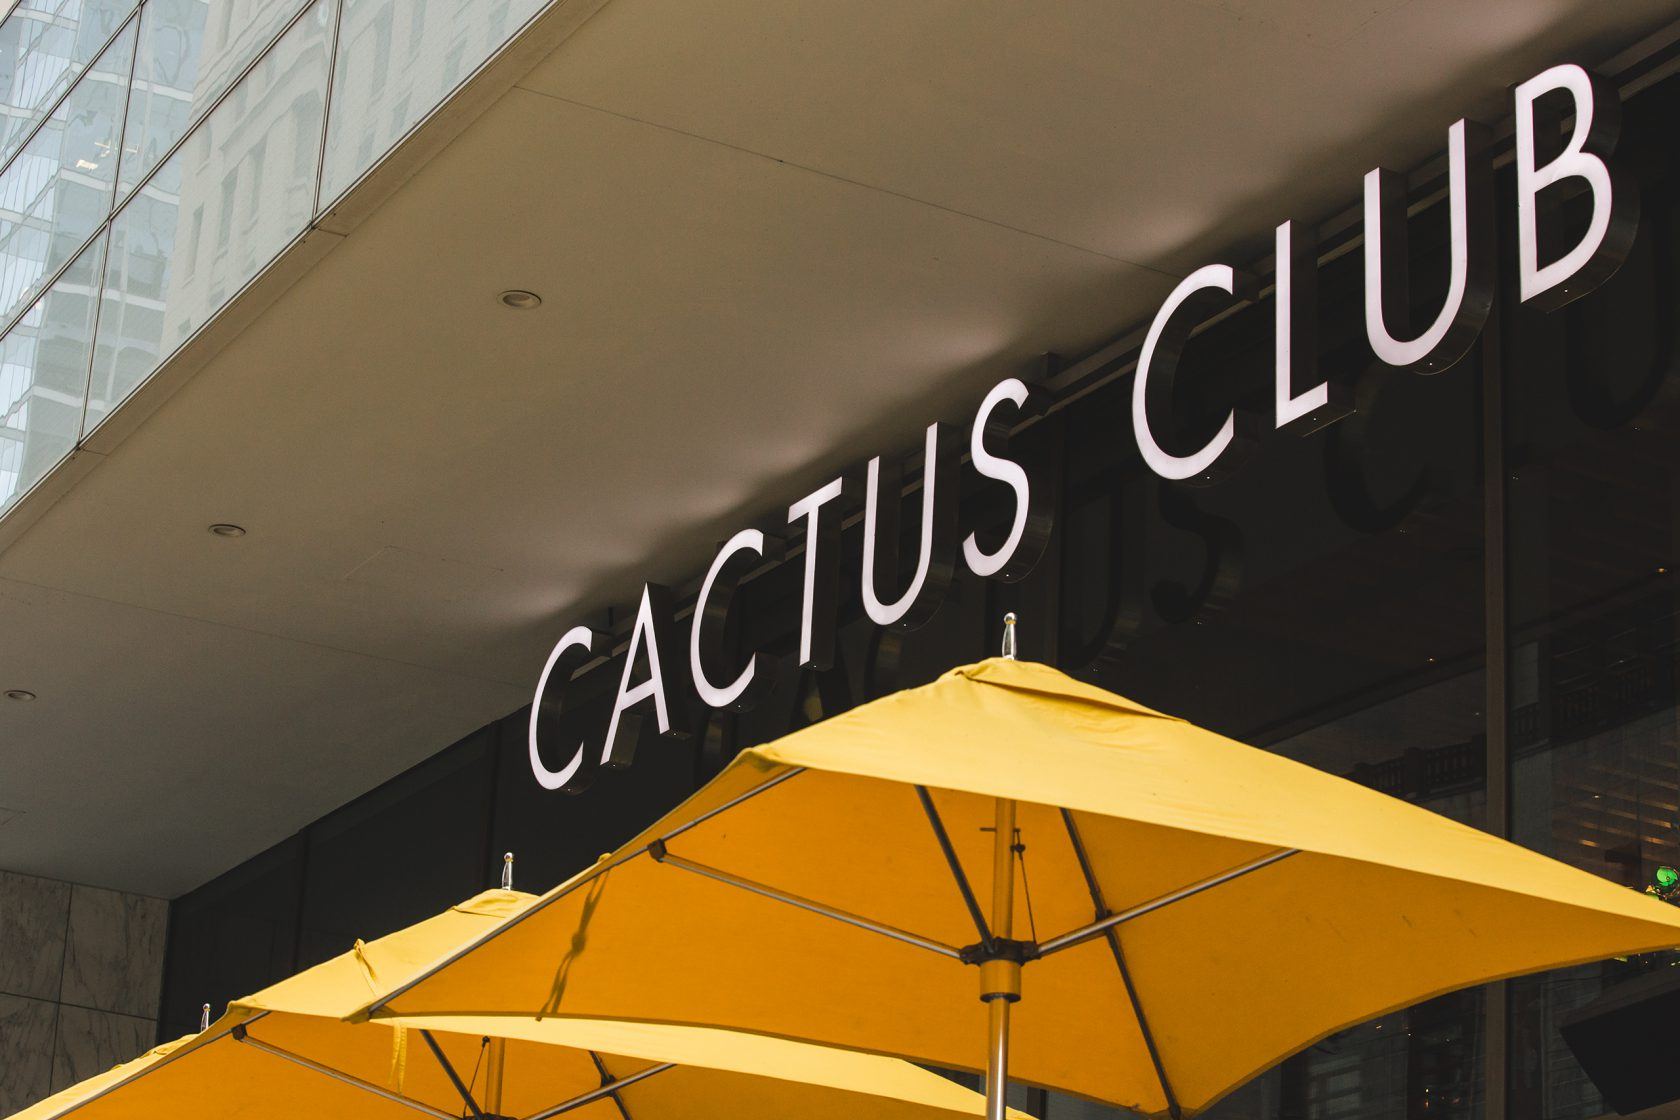 The Livmore Neighbourhood - Cactus Club (Restaurant & Bar)